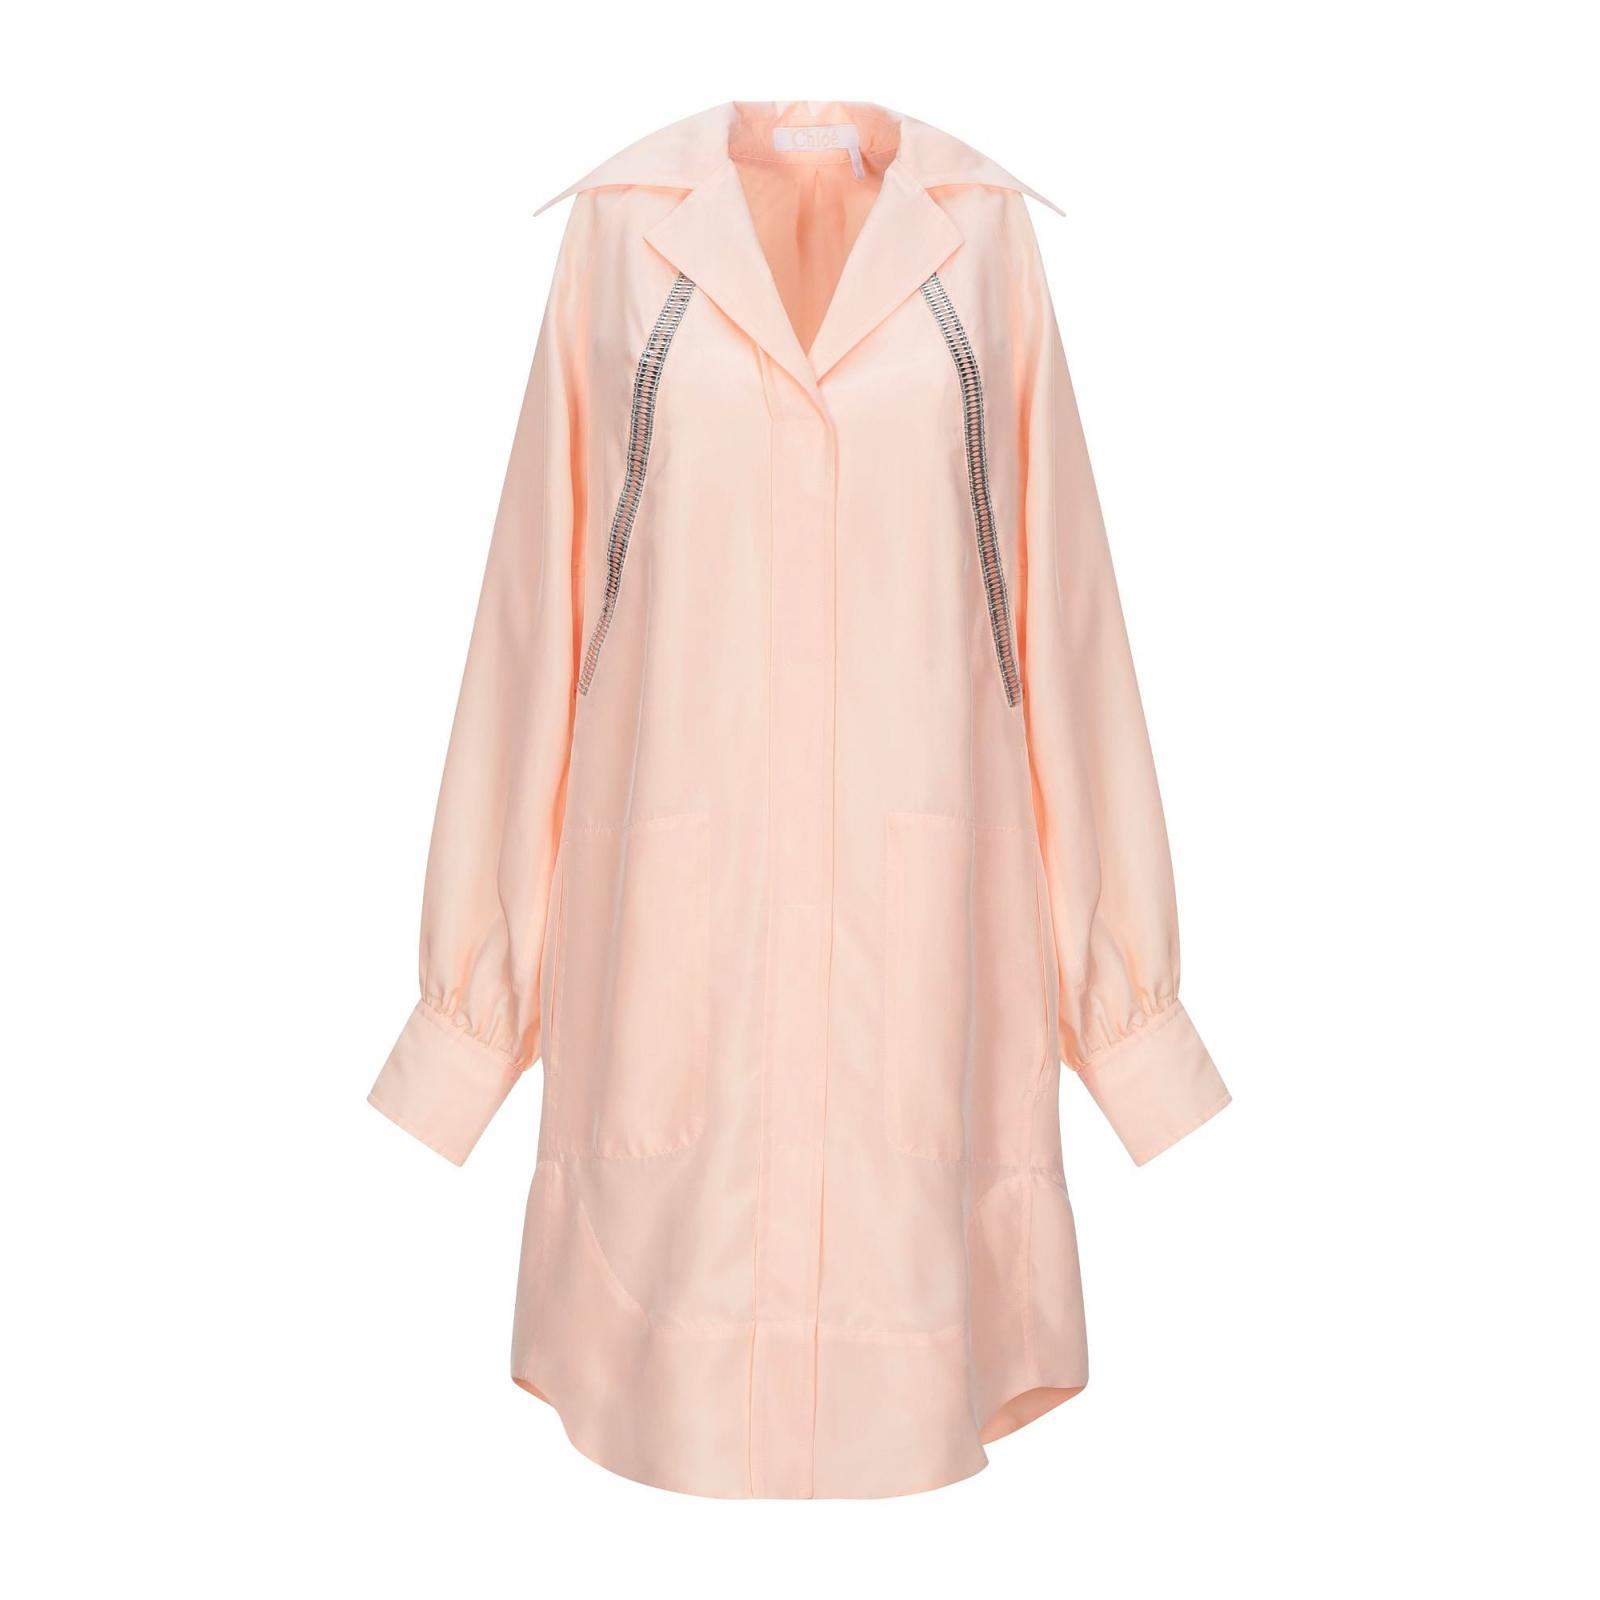 CHLOE Short dress, nowa XS-S